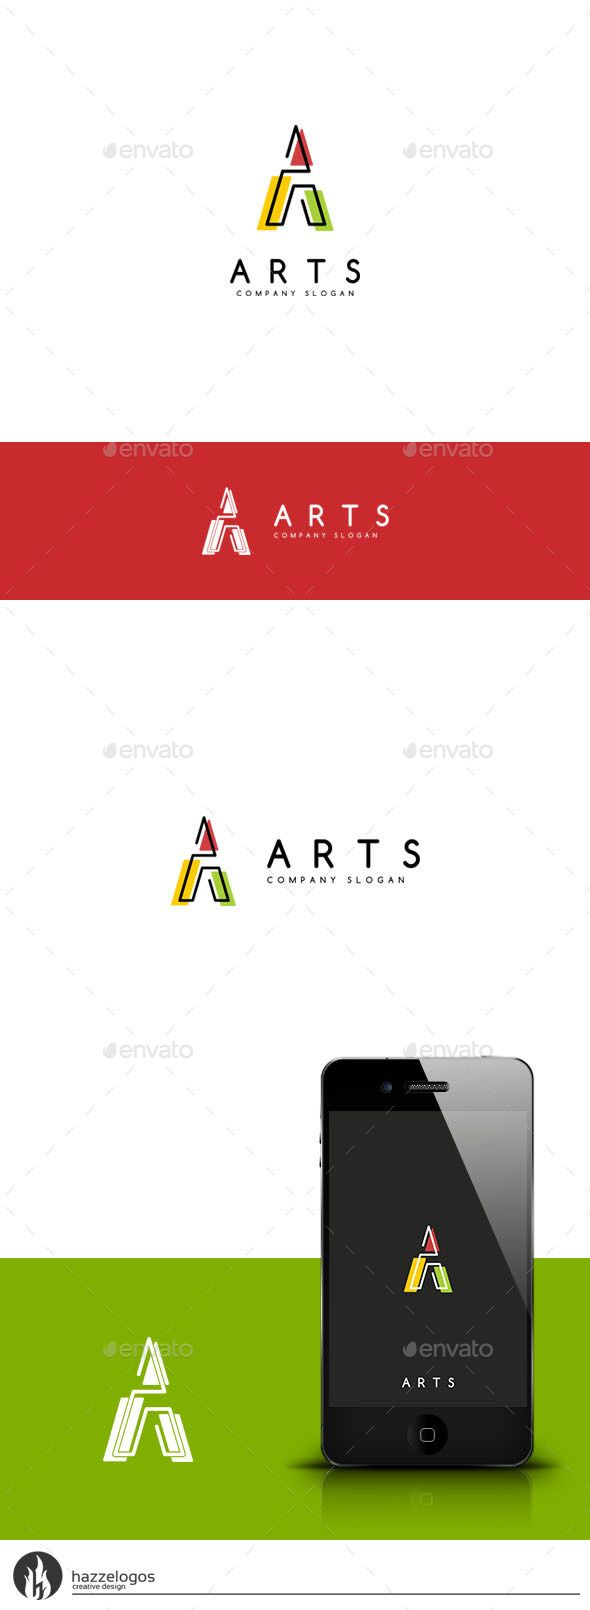 Logosmartz custom logo maker 5 0 review and download - Arts Letter A Logo